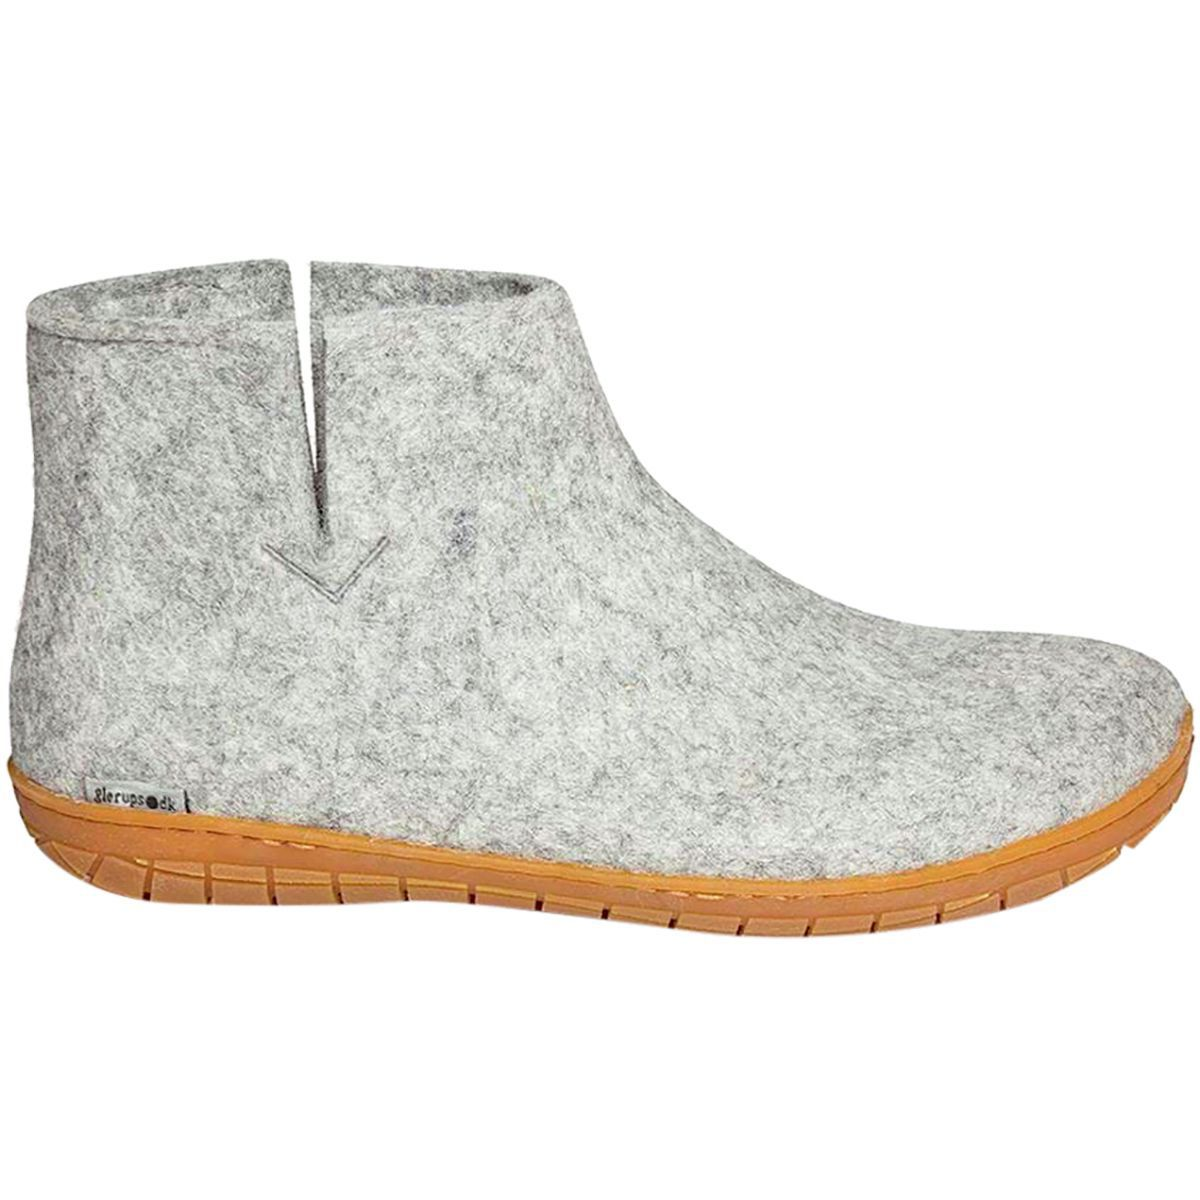 Glerups støvle med naturgummibund, koksgrå, 38